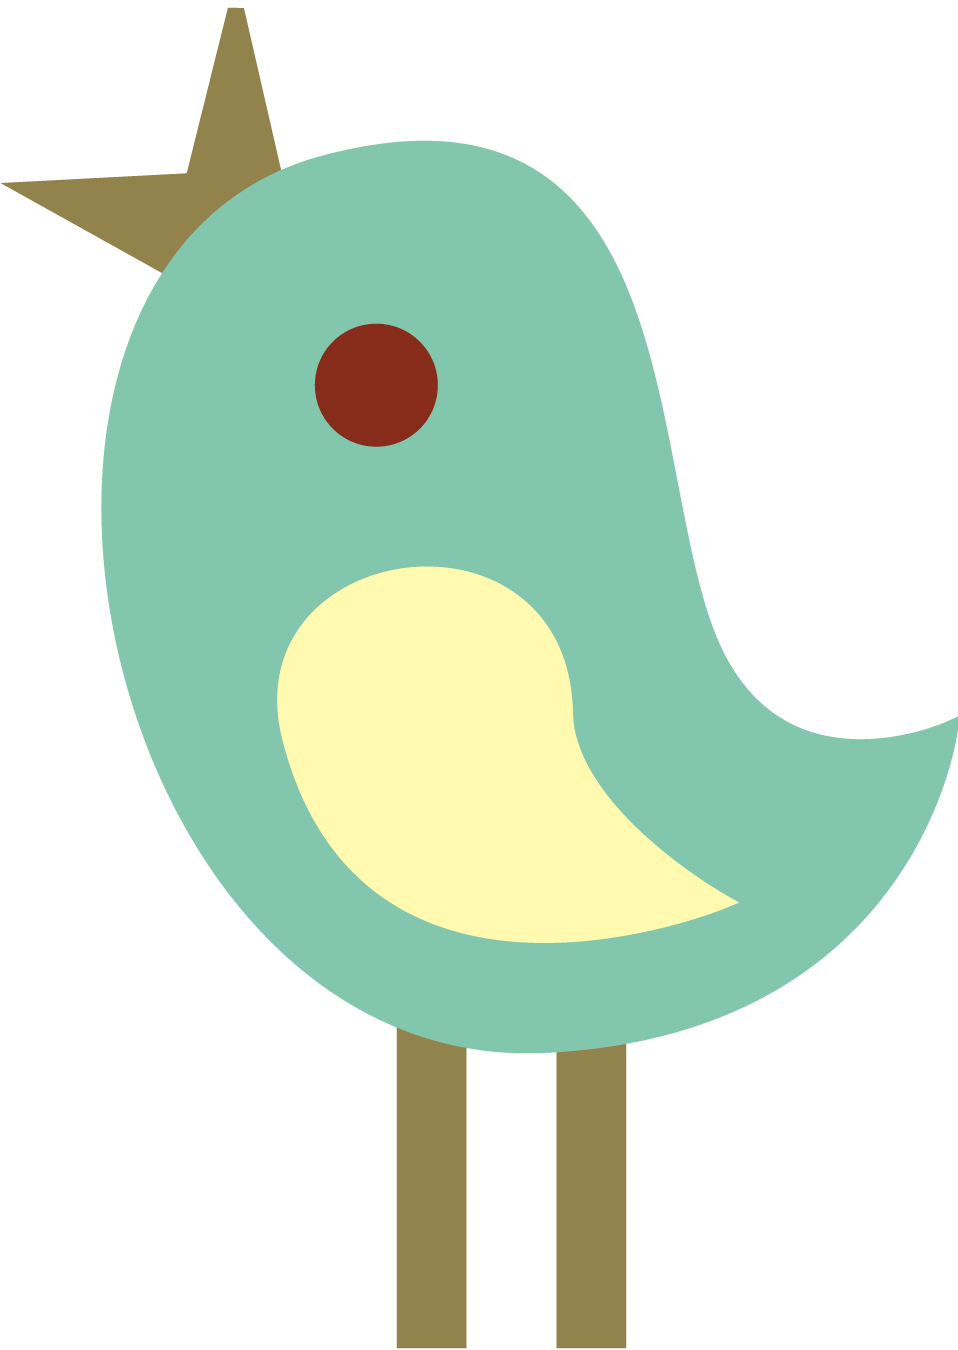 Cute Tweet Birds Clip Art Free Clipart G-Cute Tweet Birds Clip Art Free Clipart Graphics Revidevi Wordpress-16